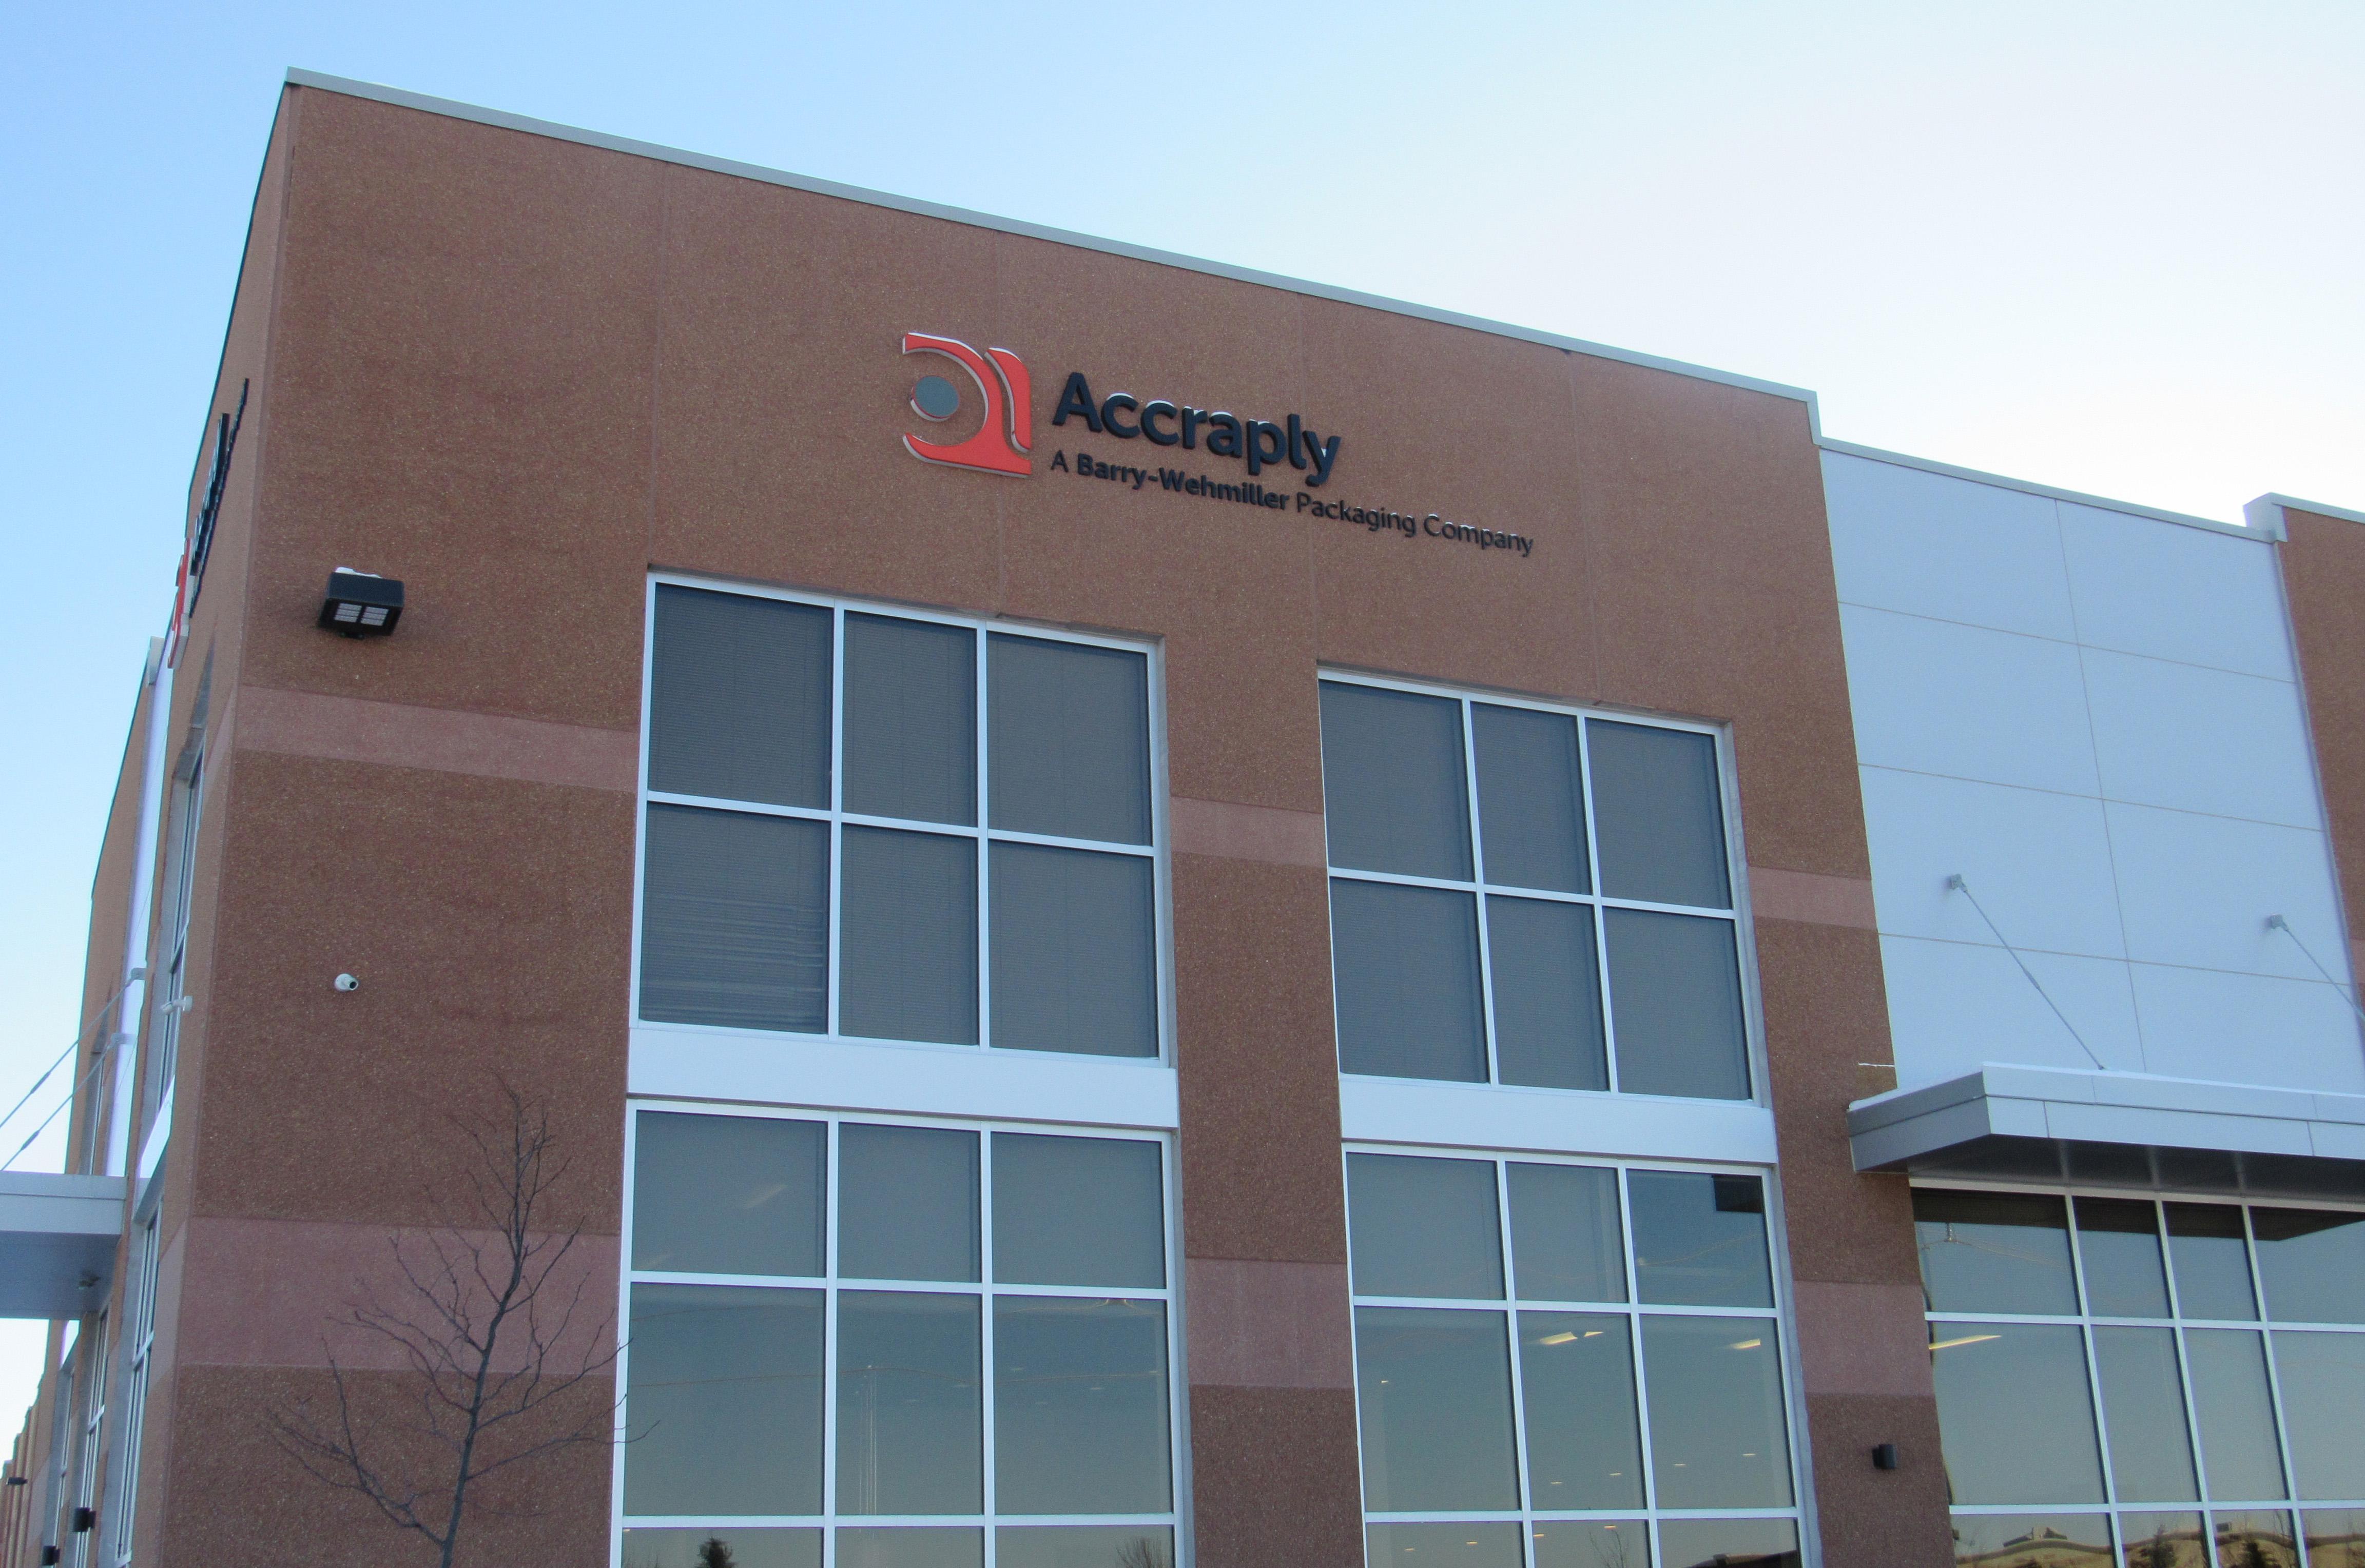 Accraply Building